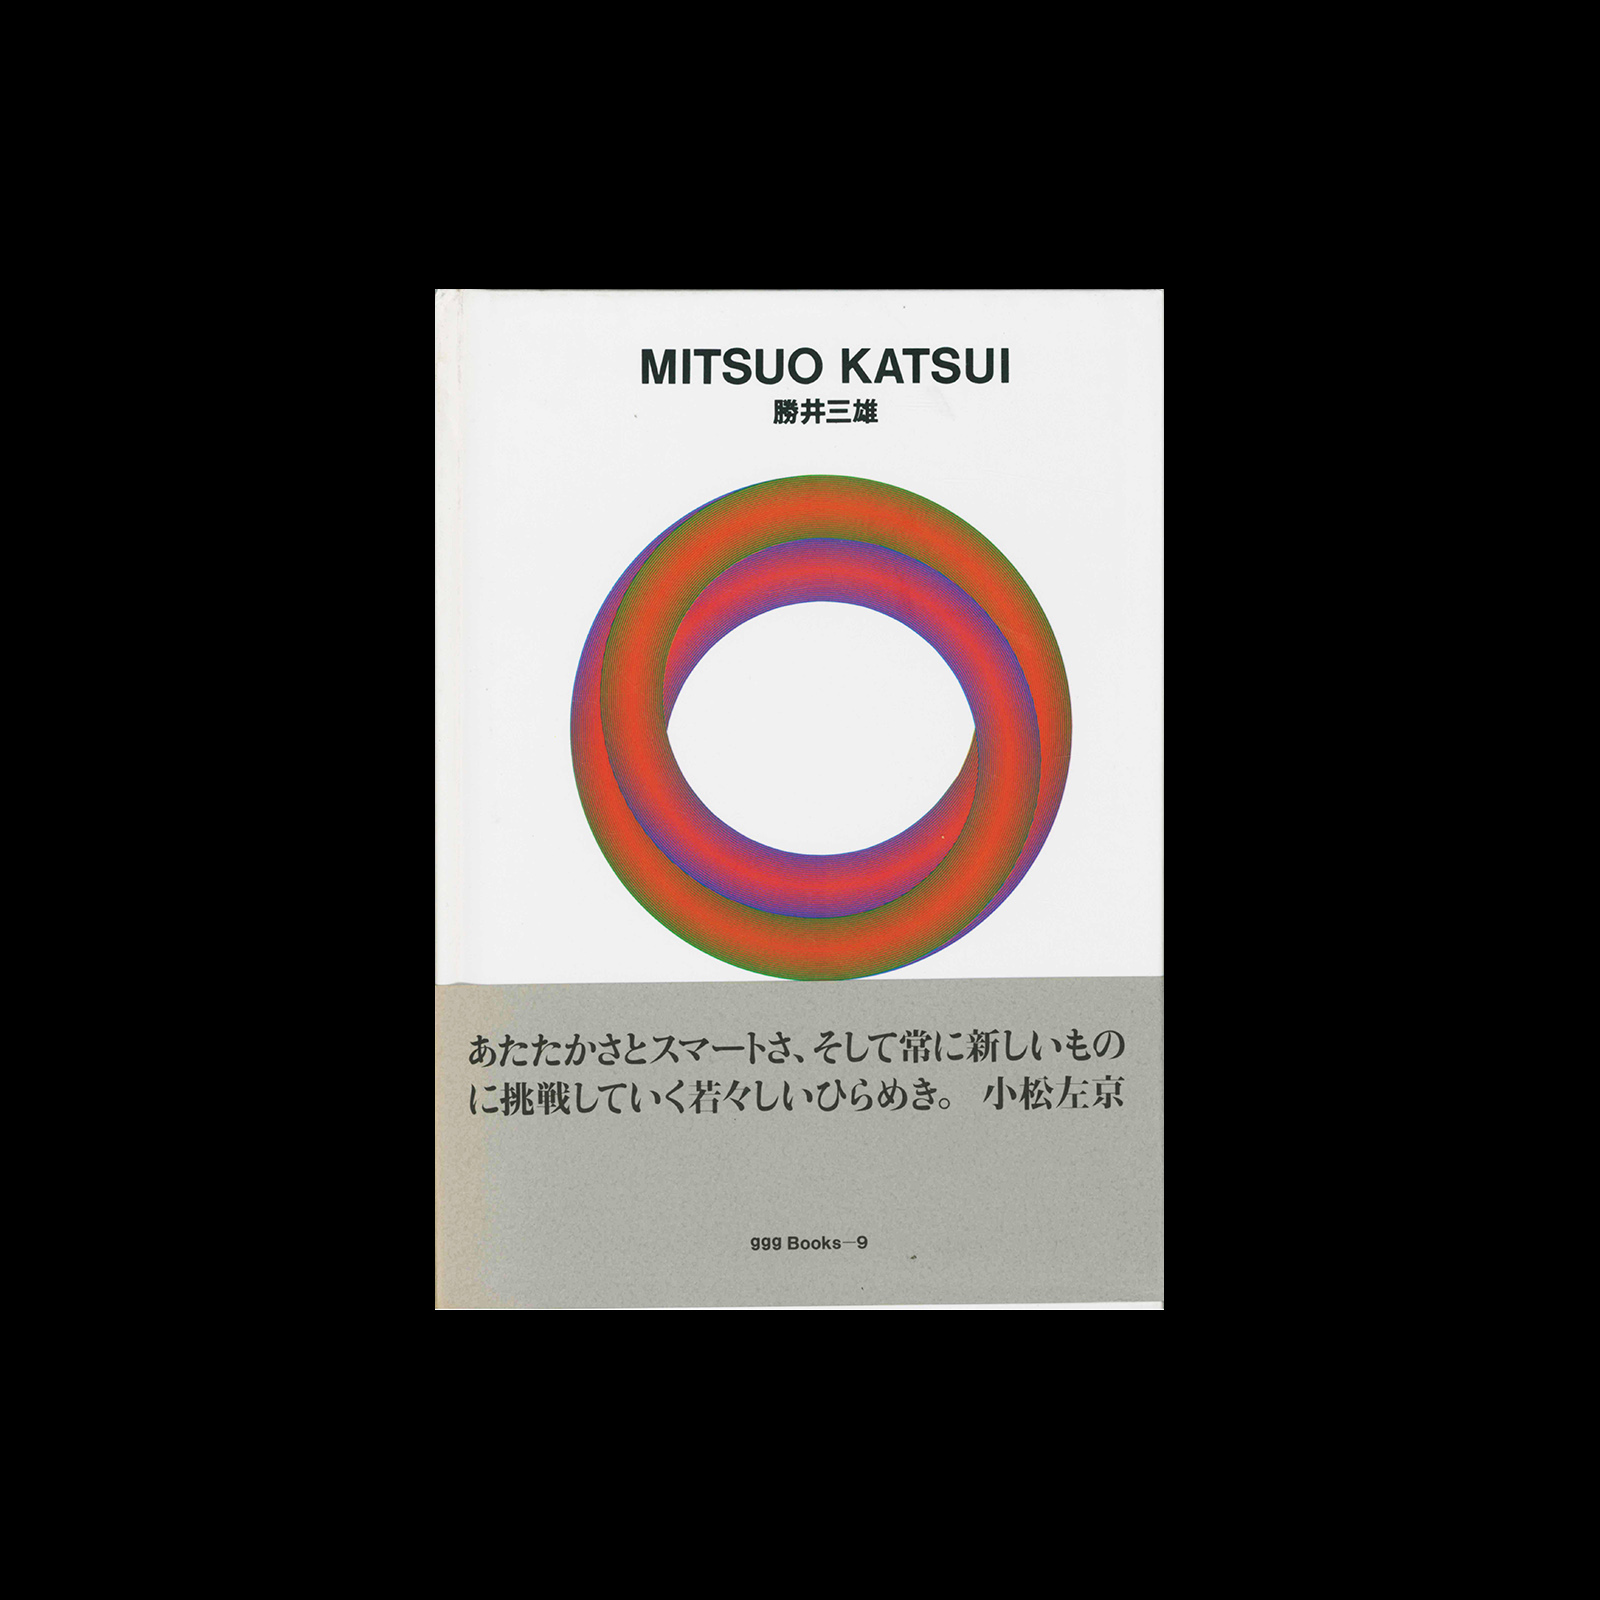 Ginza Graphic Gallery 09, Mitsuo Katsui